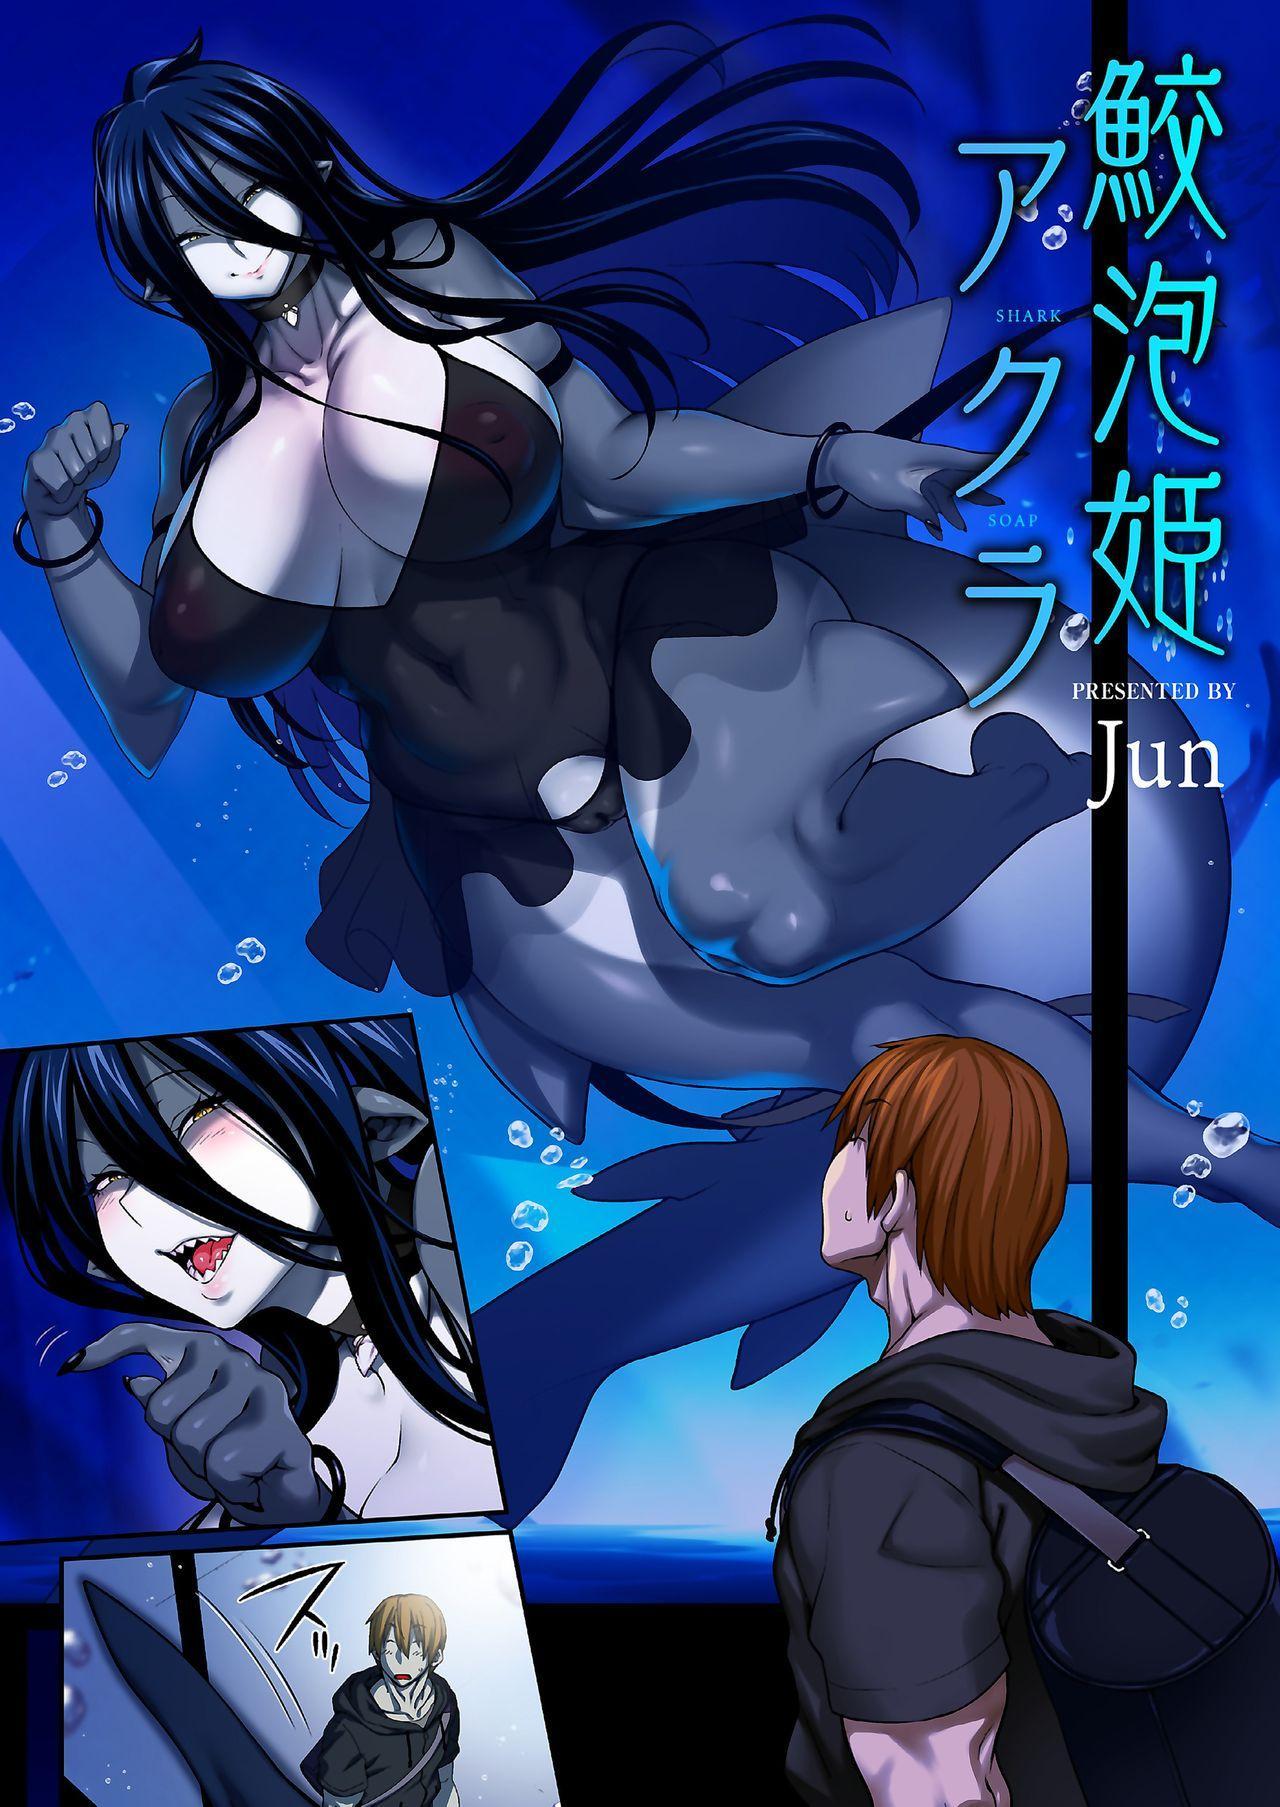 Awasamehime Akula | Bubble Shark Princess Akula 0